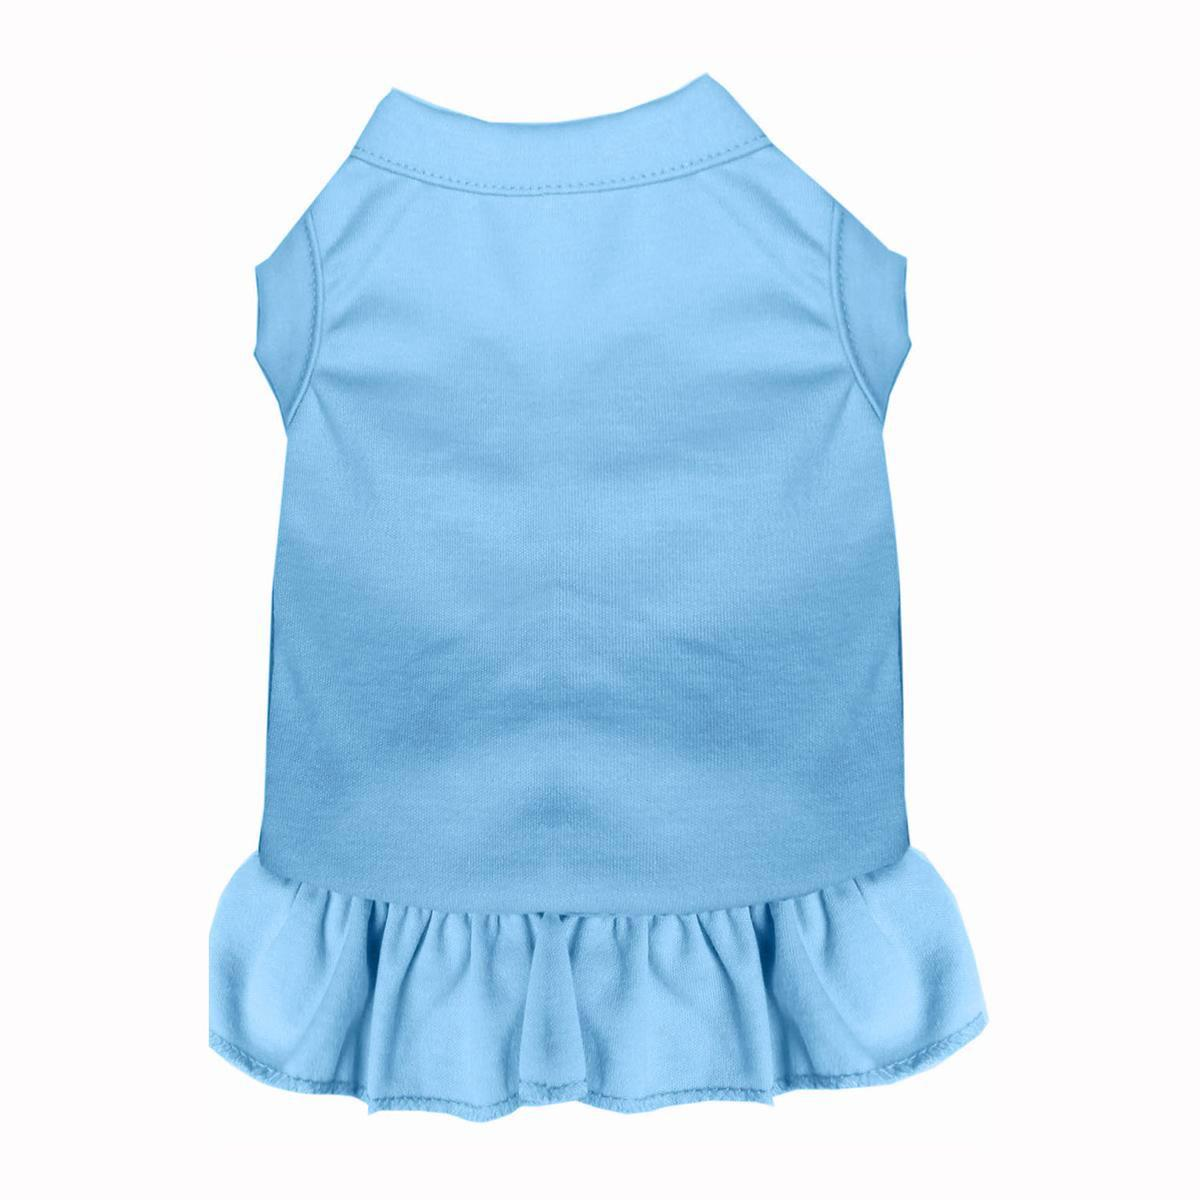 Plain Dog and Cat Dress - Baby Blue